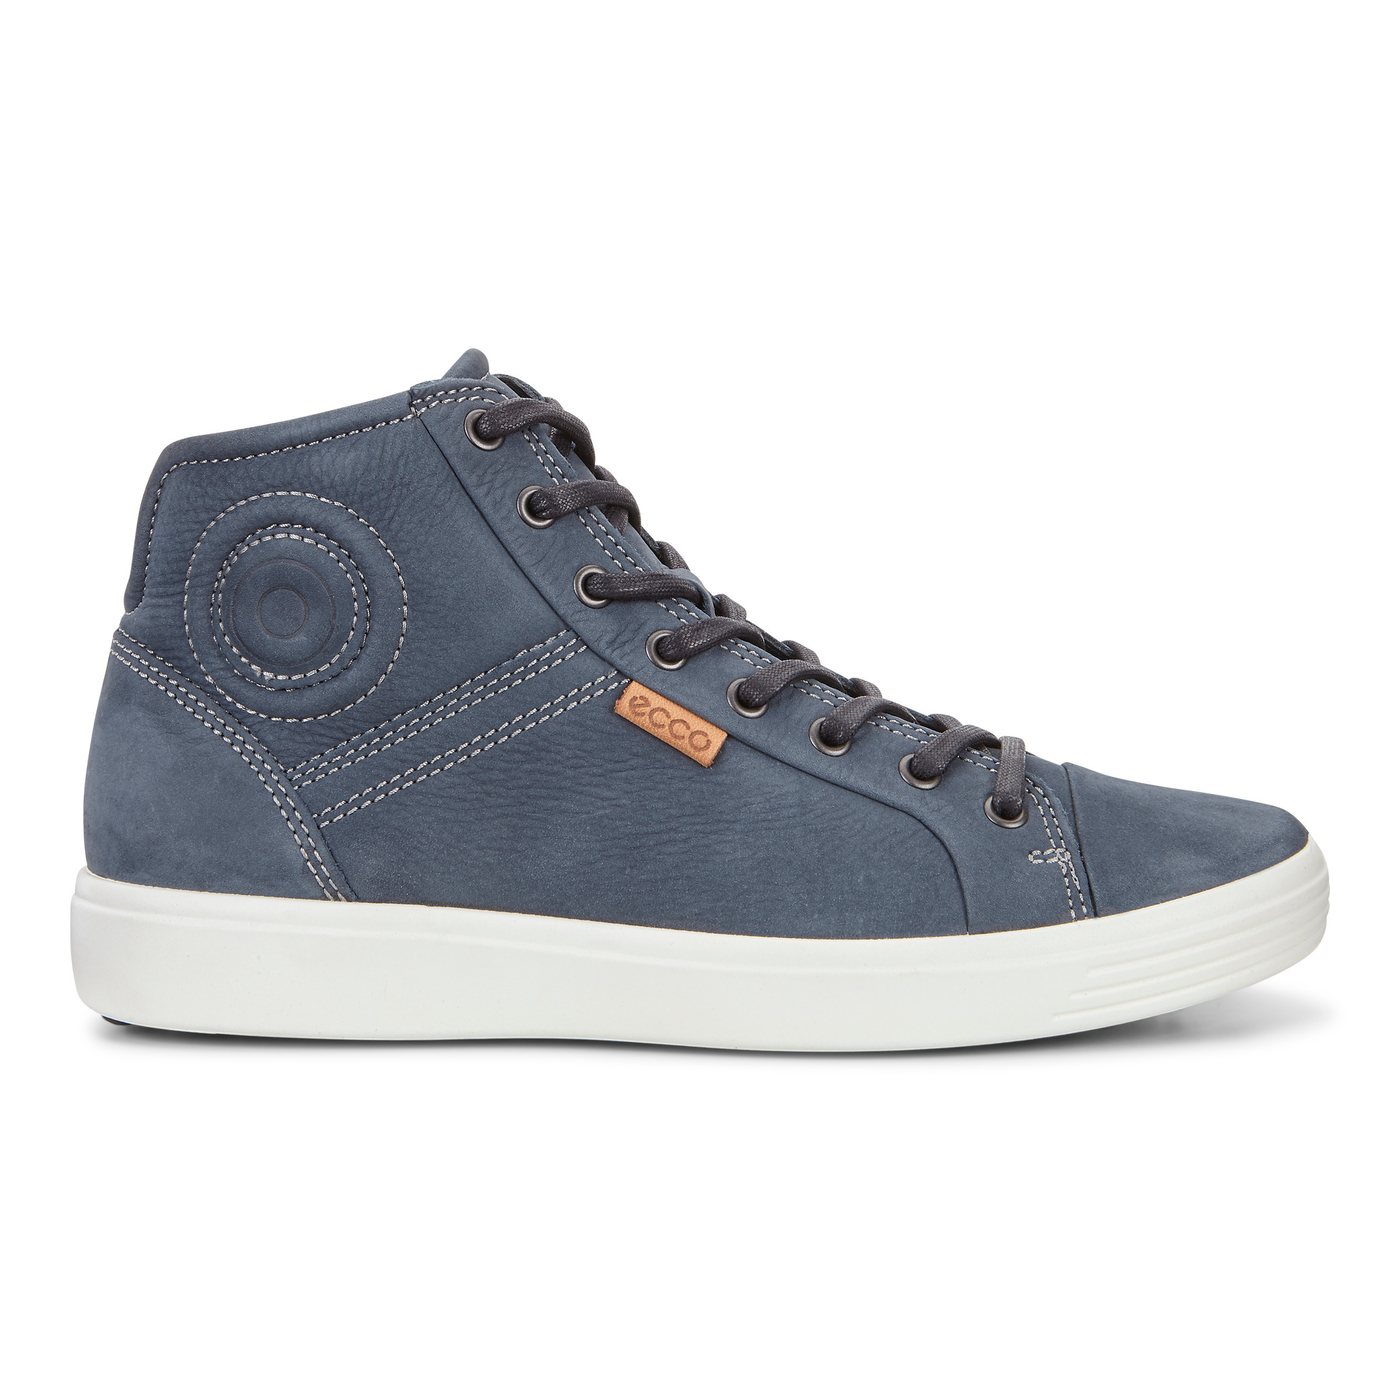 35e8882eb5 ECCO Men's Soft 7 High Top | Men's Casual Boots | ECCO® Shoes